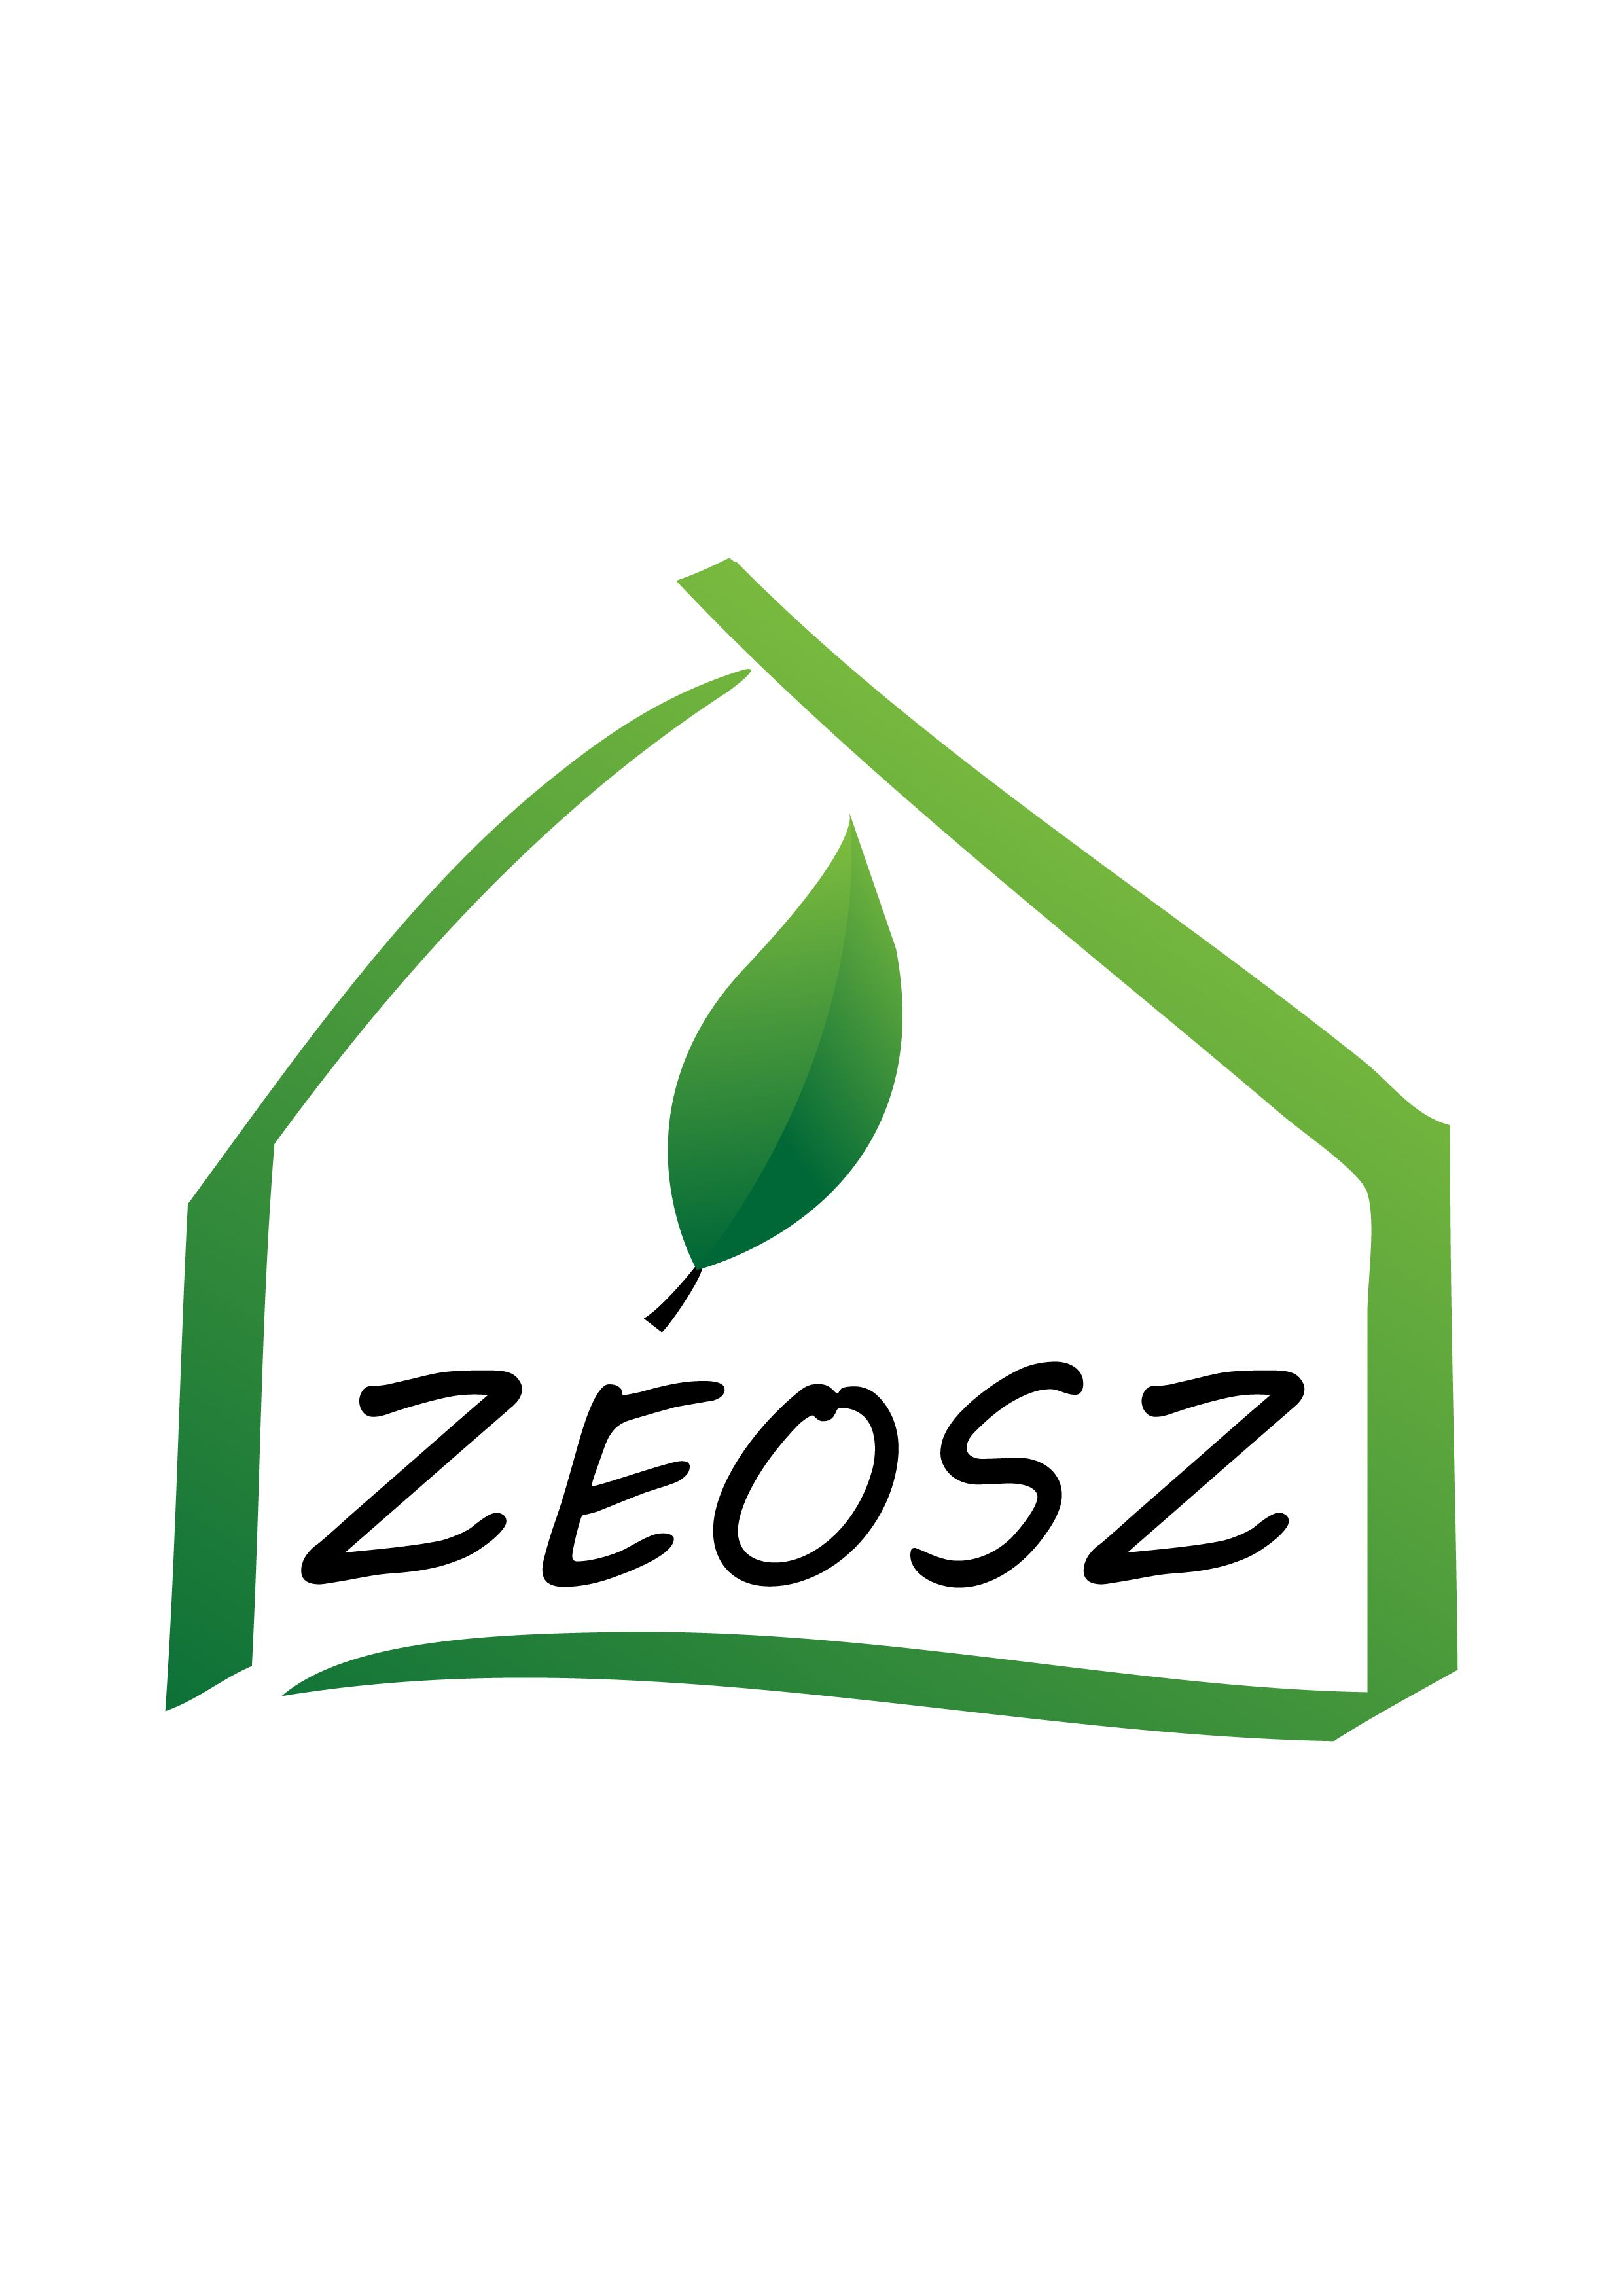 zeosz_logojpeg